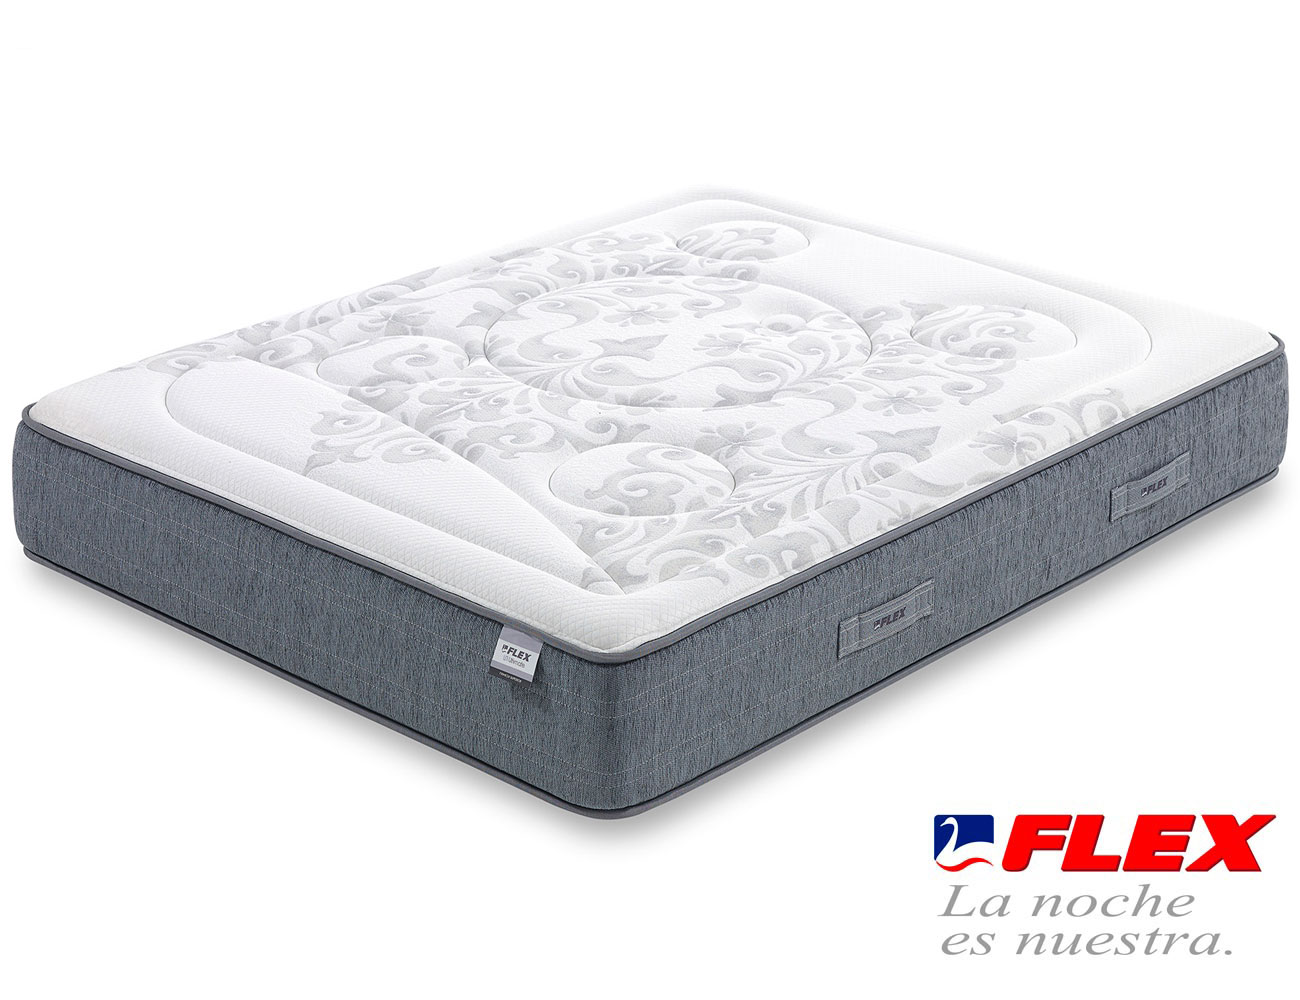 Colchon flex airvex viscoelastica gel garbi superior13